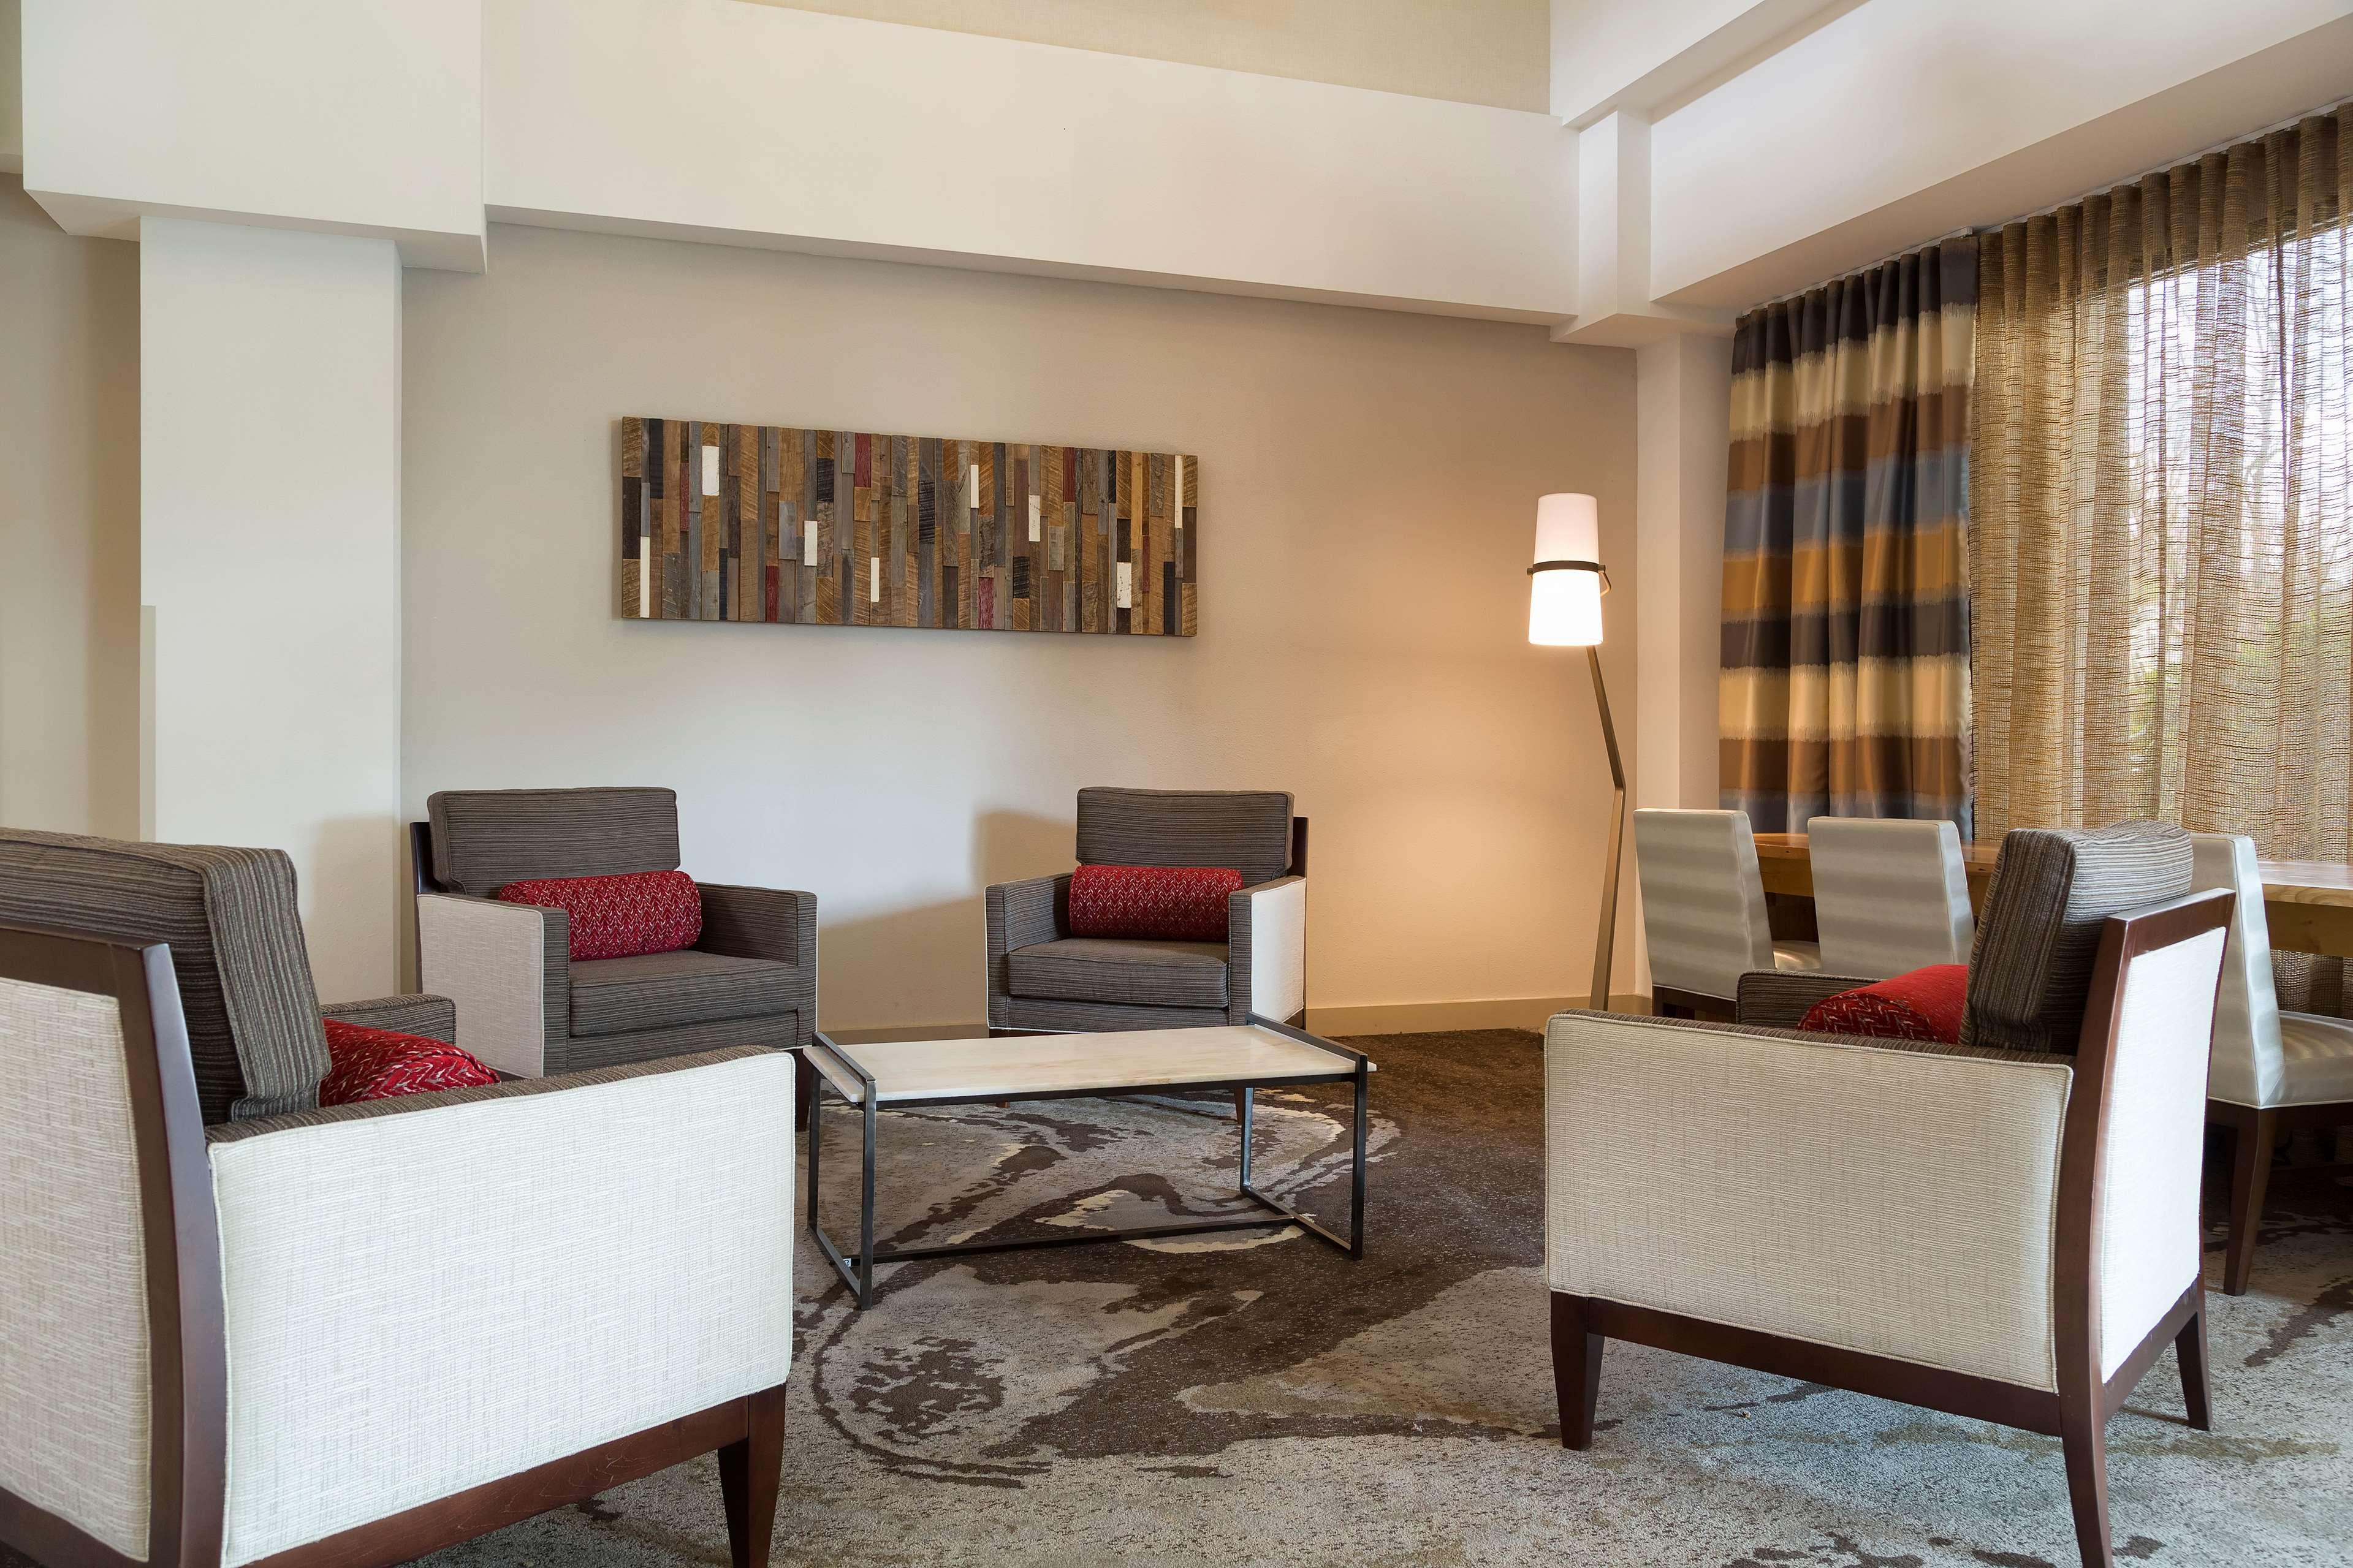 DoubleTree Suites by Hilton Hotel Nashville Airport image 4